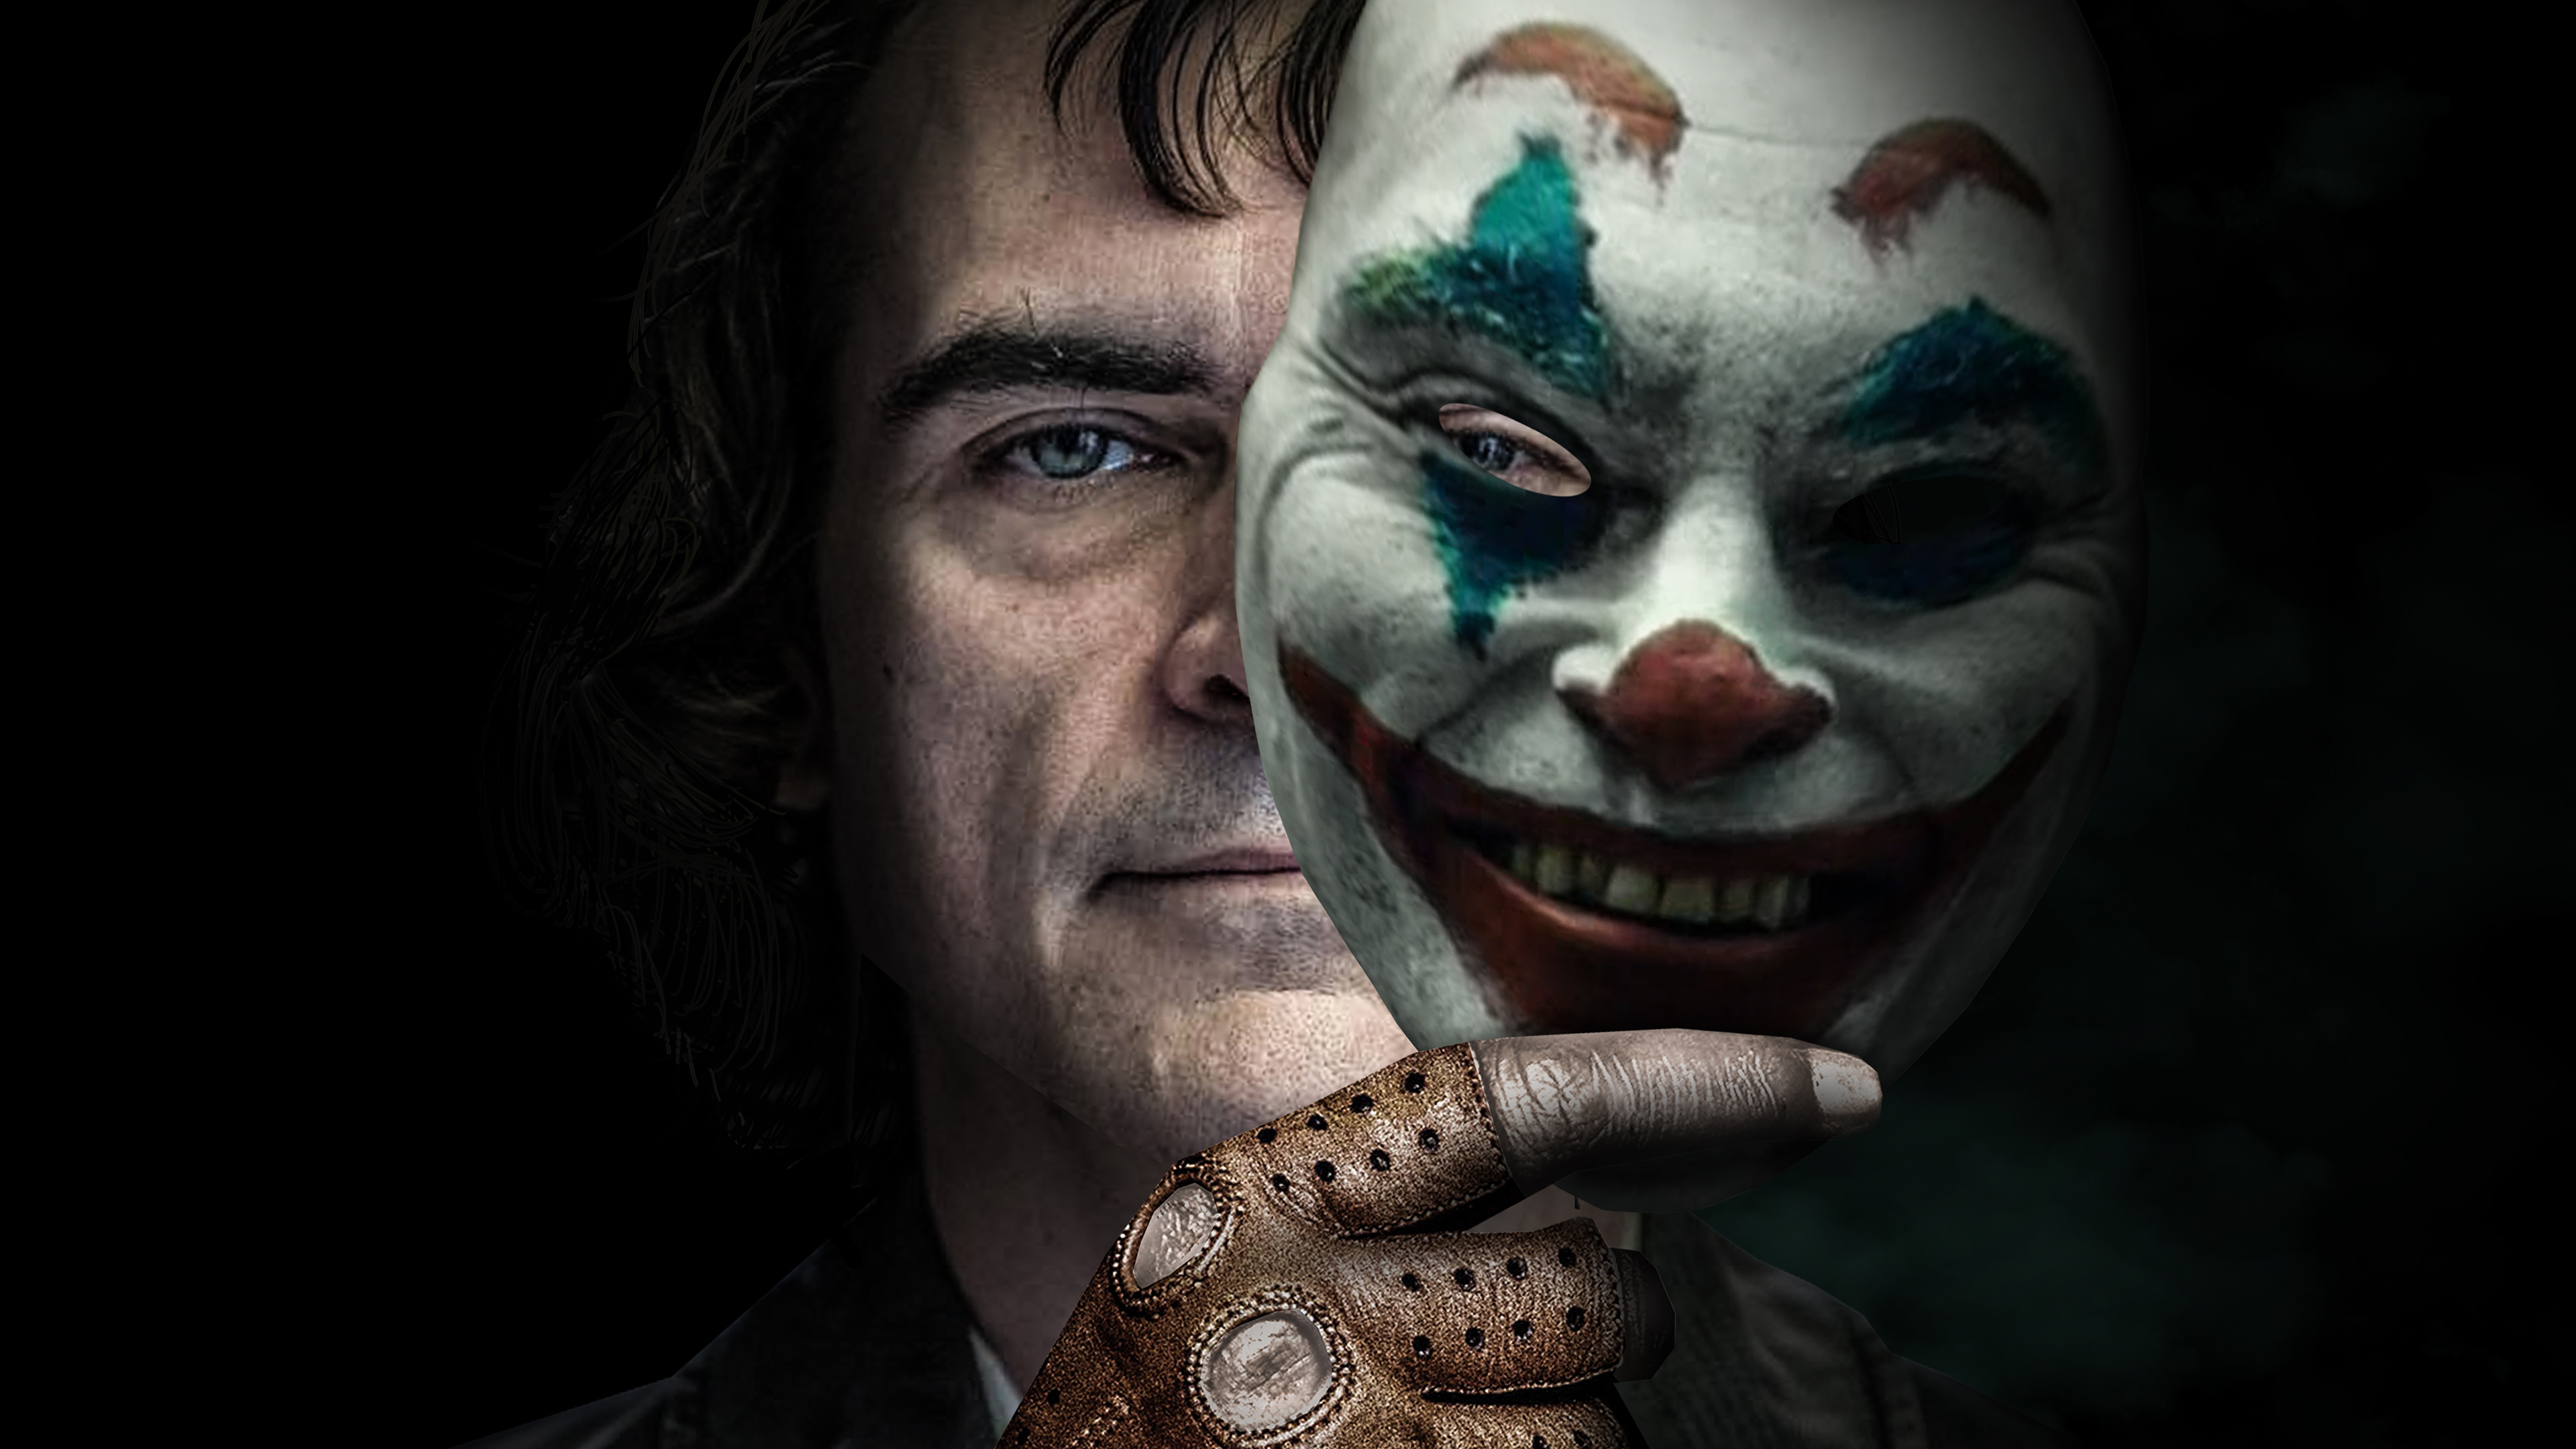 Movie Poster 2019: Joker 2019 Movie 4k, HD Movies, 4k Wallpapers, Images